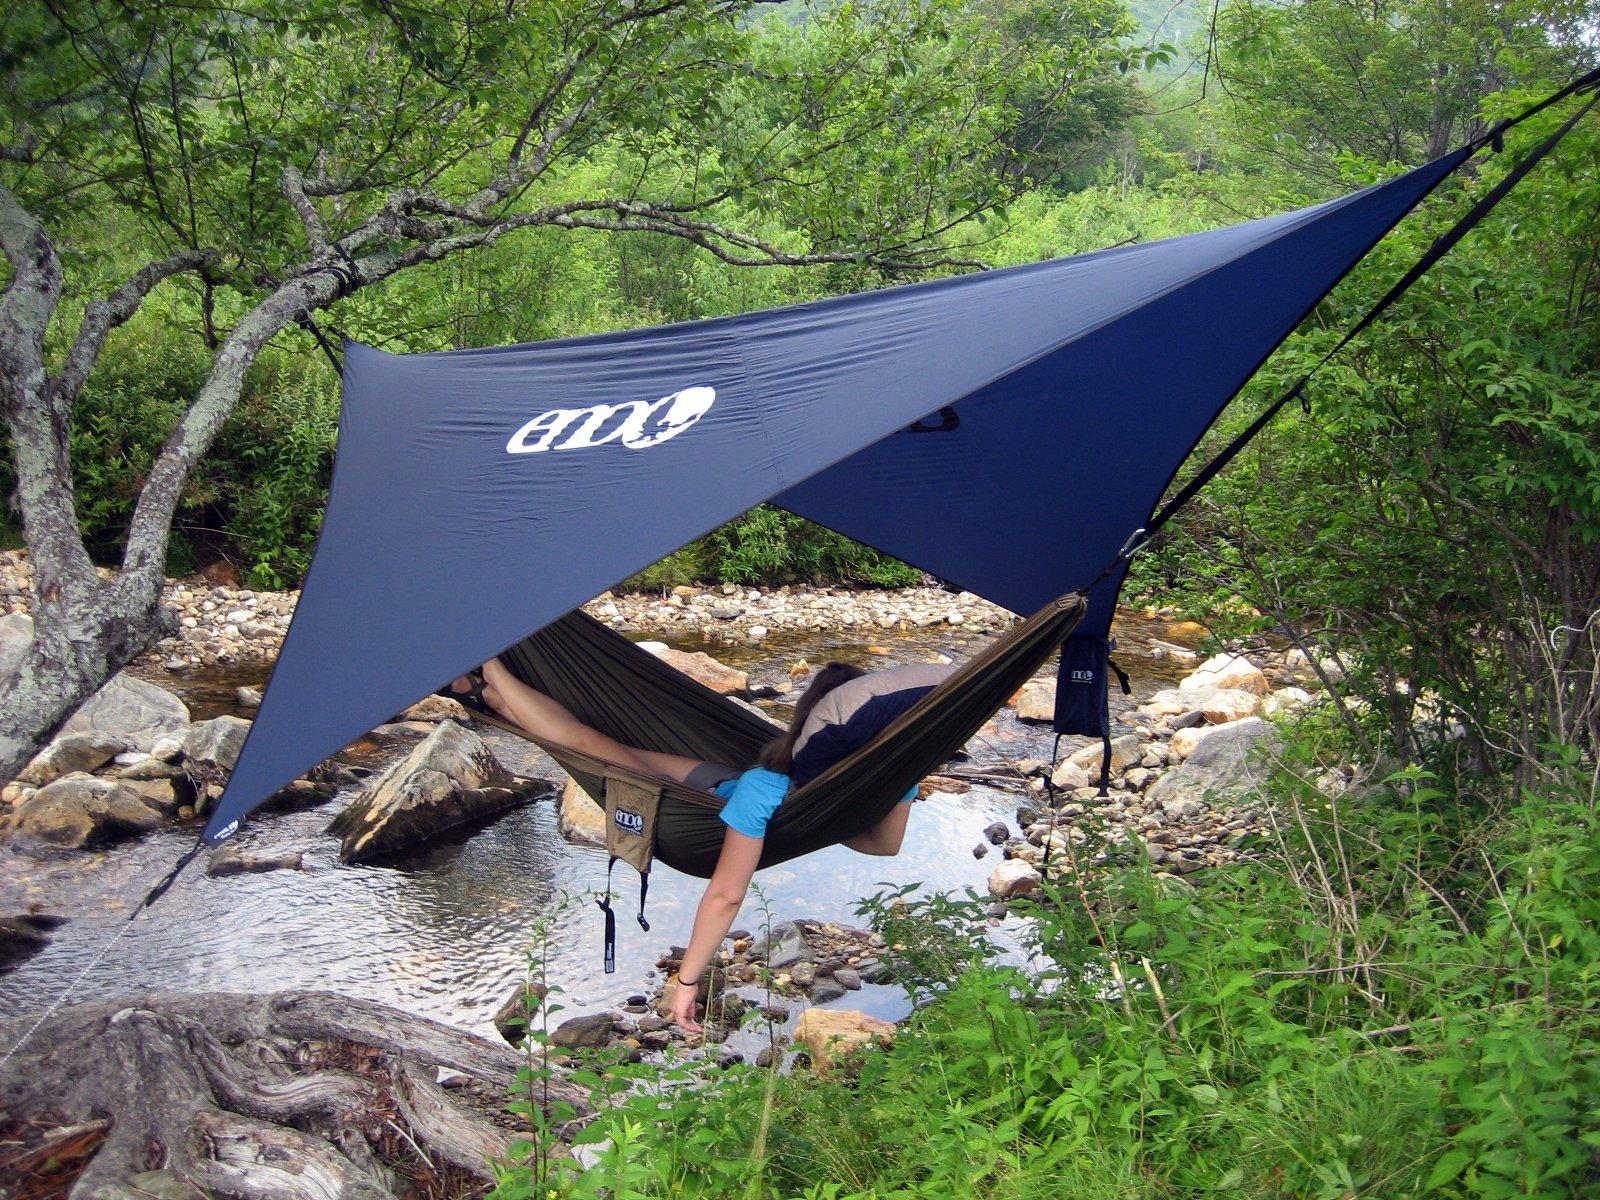 Eno Fast Fly Rain Tarp Outdoor Camping Protection Ripstop